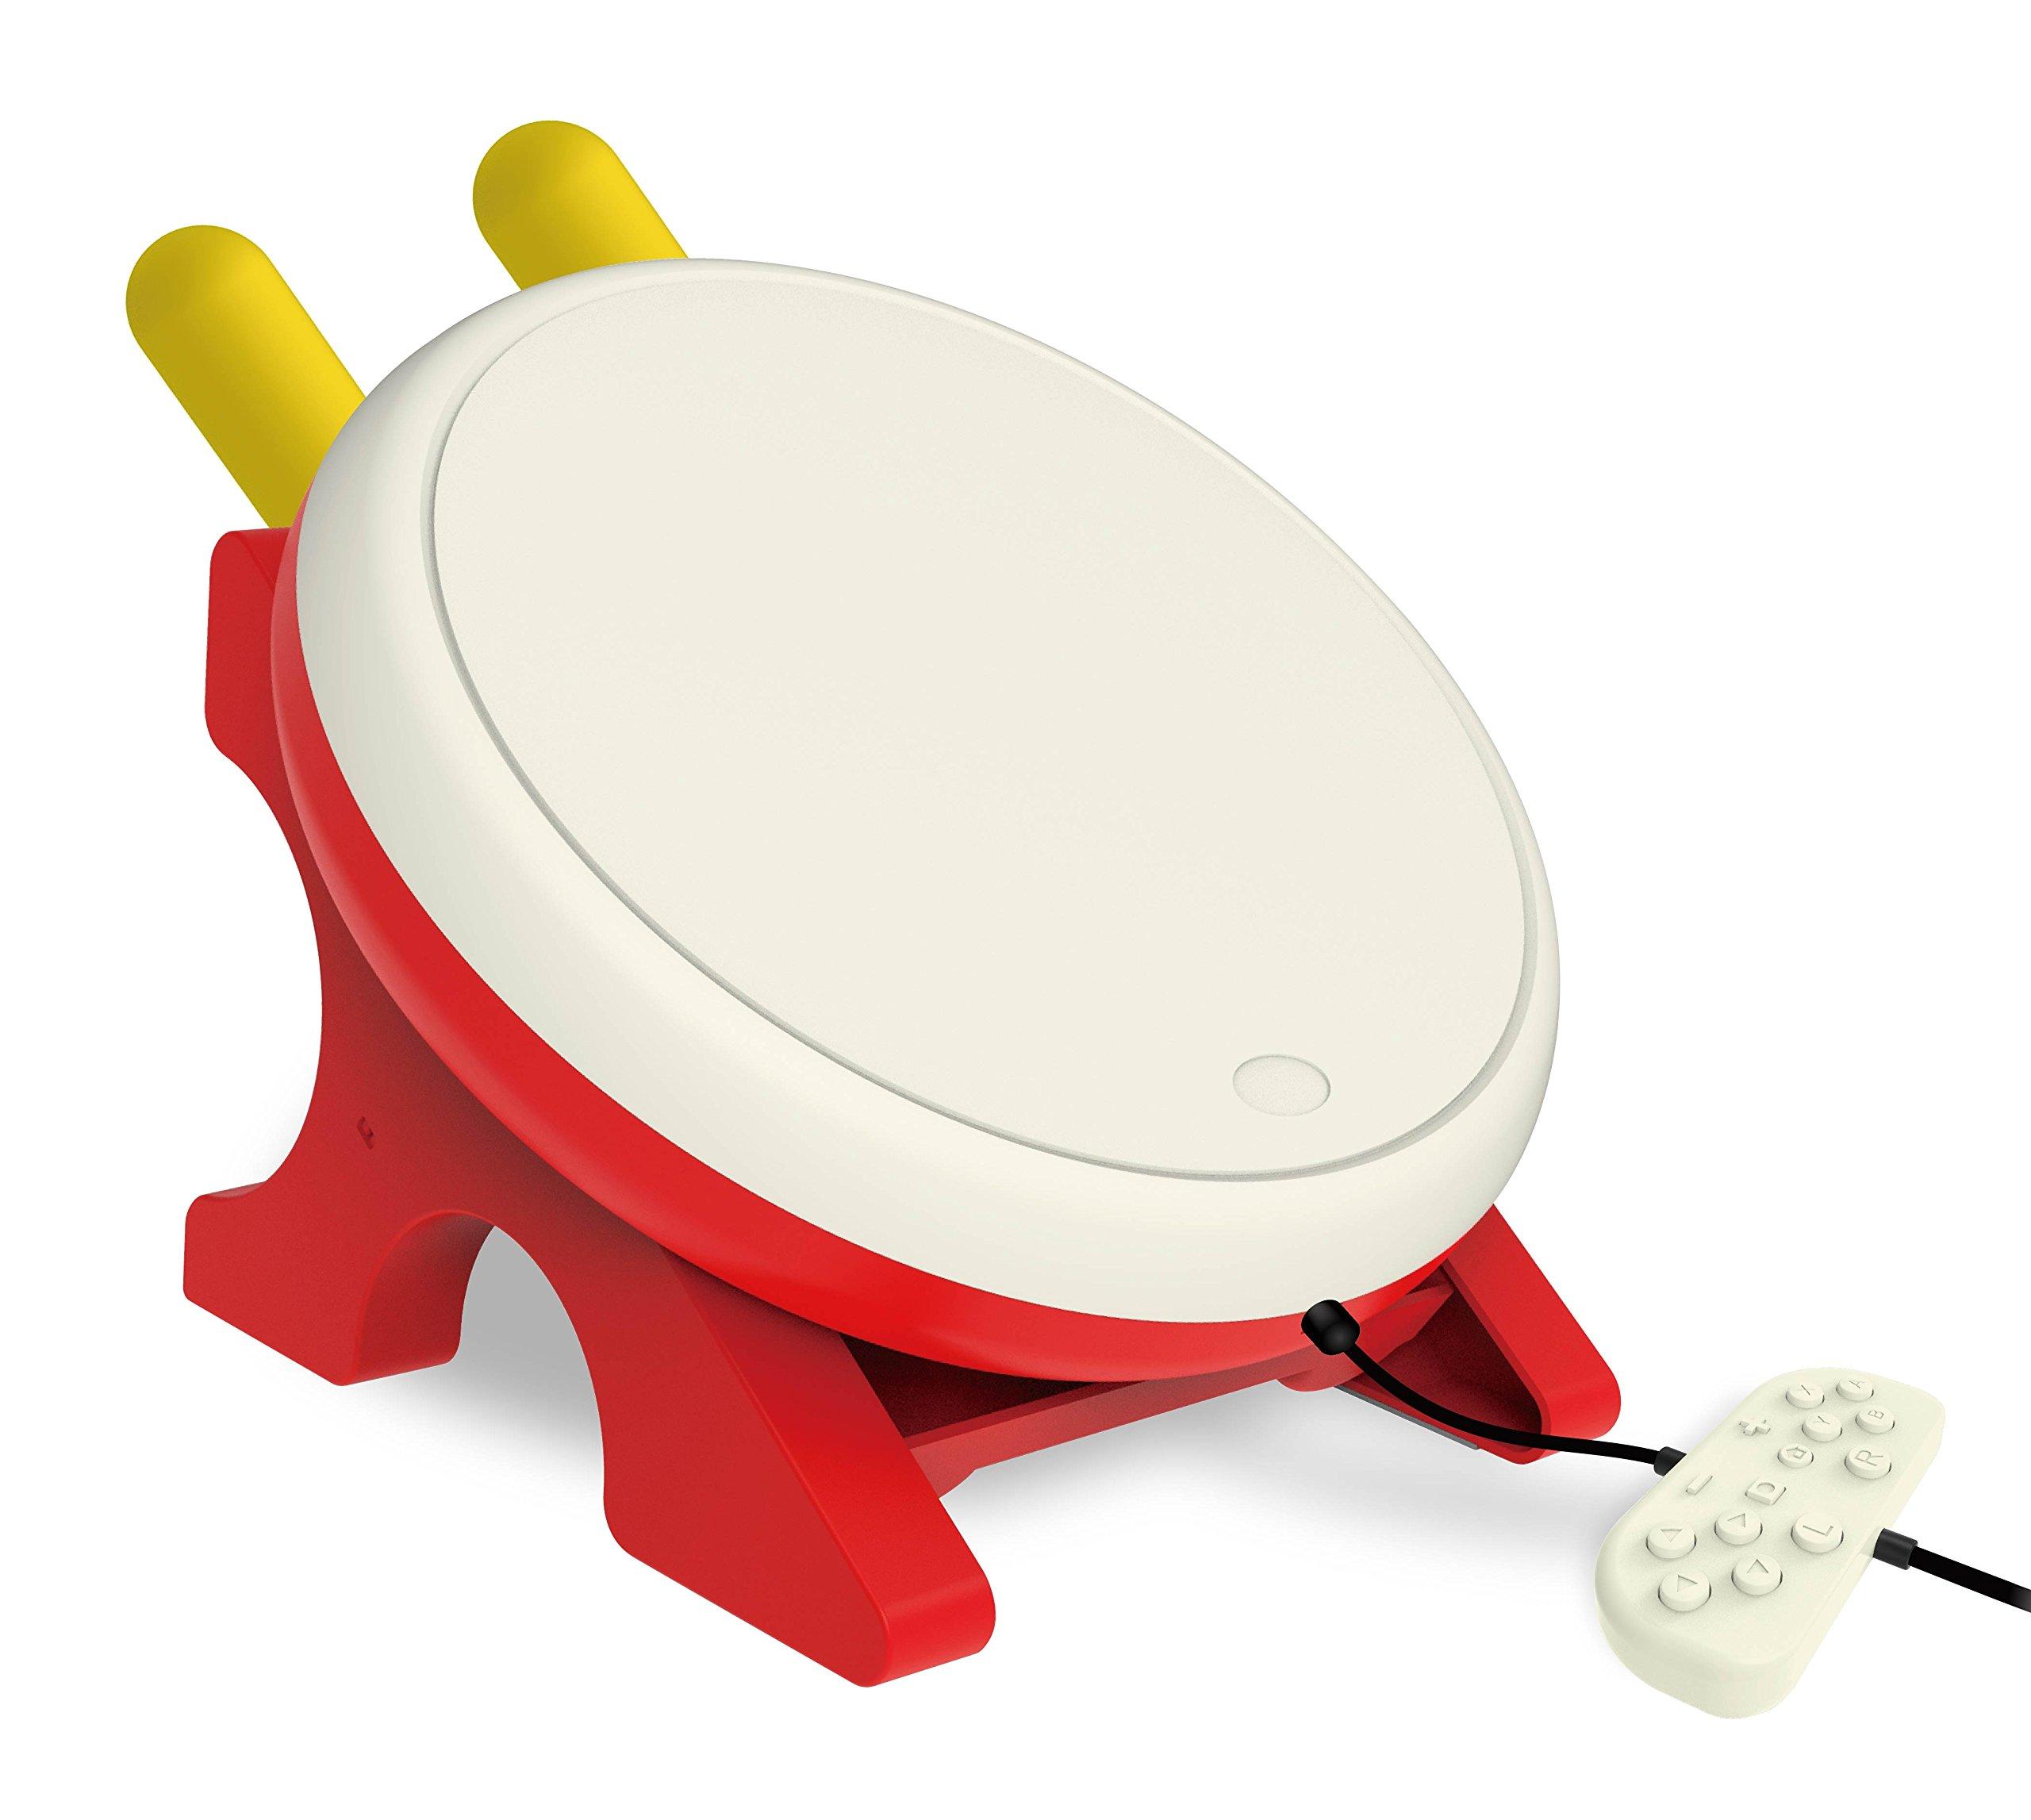 ESYWEN Nintendo Switchに対応太鼓の達人適用太鼓とバチ 太鼓の達人専用コントローラー 感度抜群の太鼓コントローラー